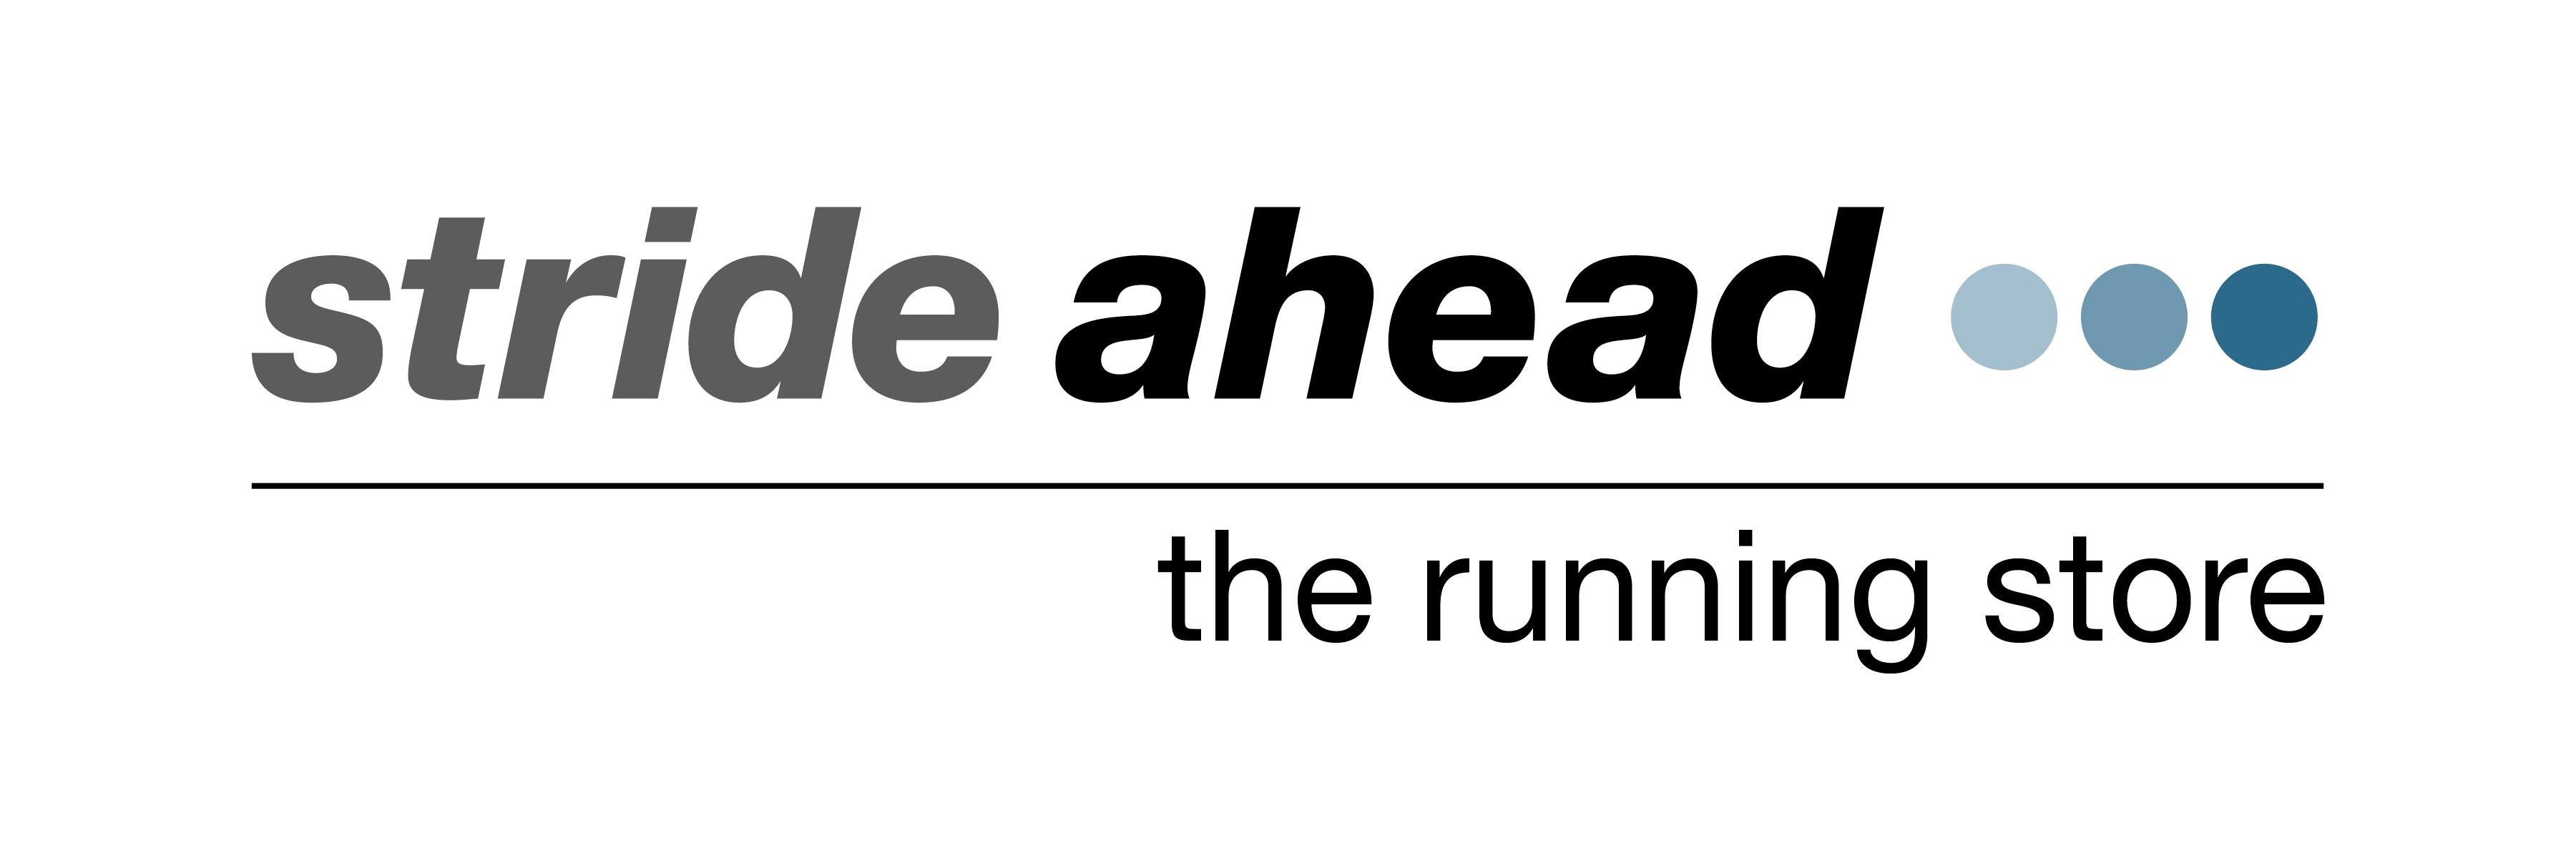 2016 Stride Ahead logo